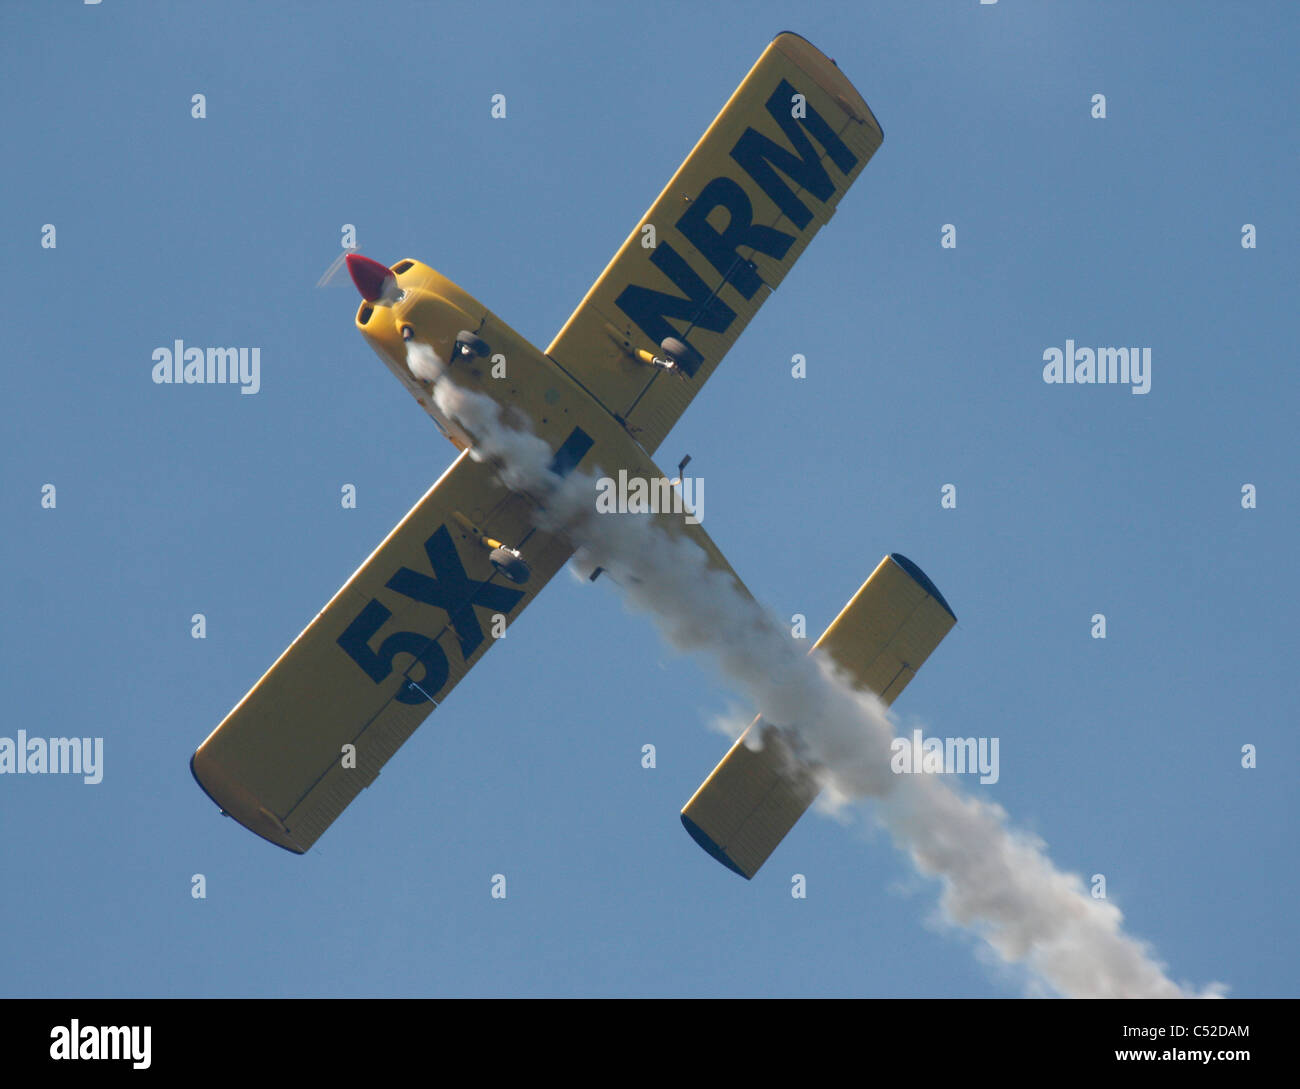 A Fuji FA200 Aero Subaru single engine aerobatic plane spewing smoke - Stock Image